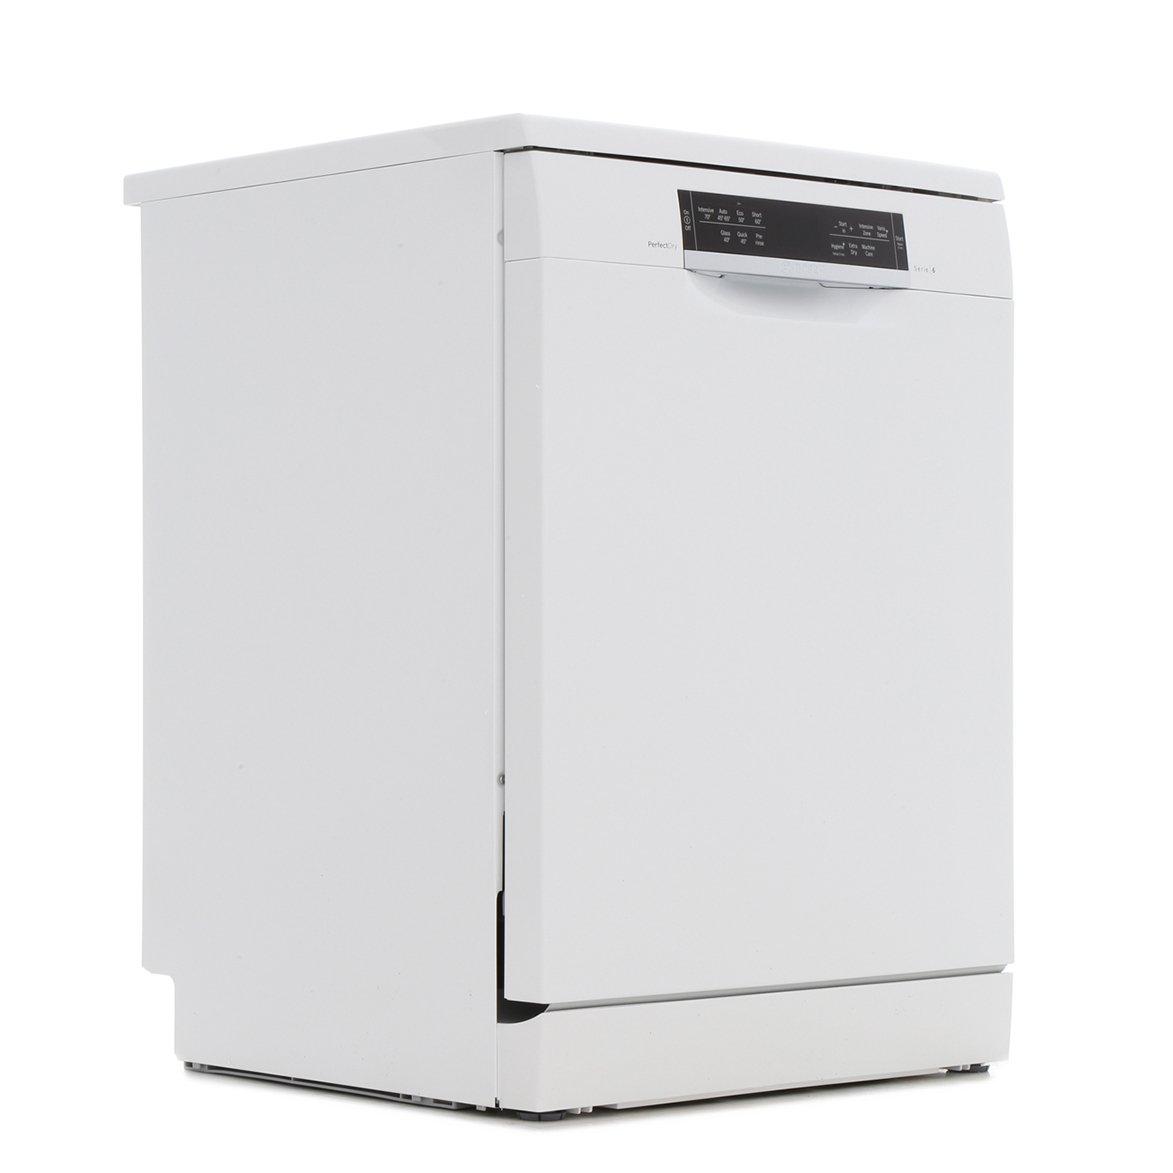 buy bosch serie 6 sms67mw00g dishwasher sms67mw00g. Black Bedroom Furniture Sets. Home Design Ideas